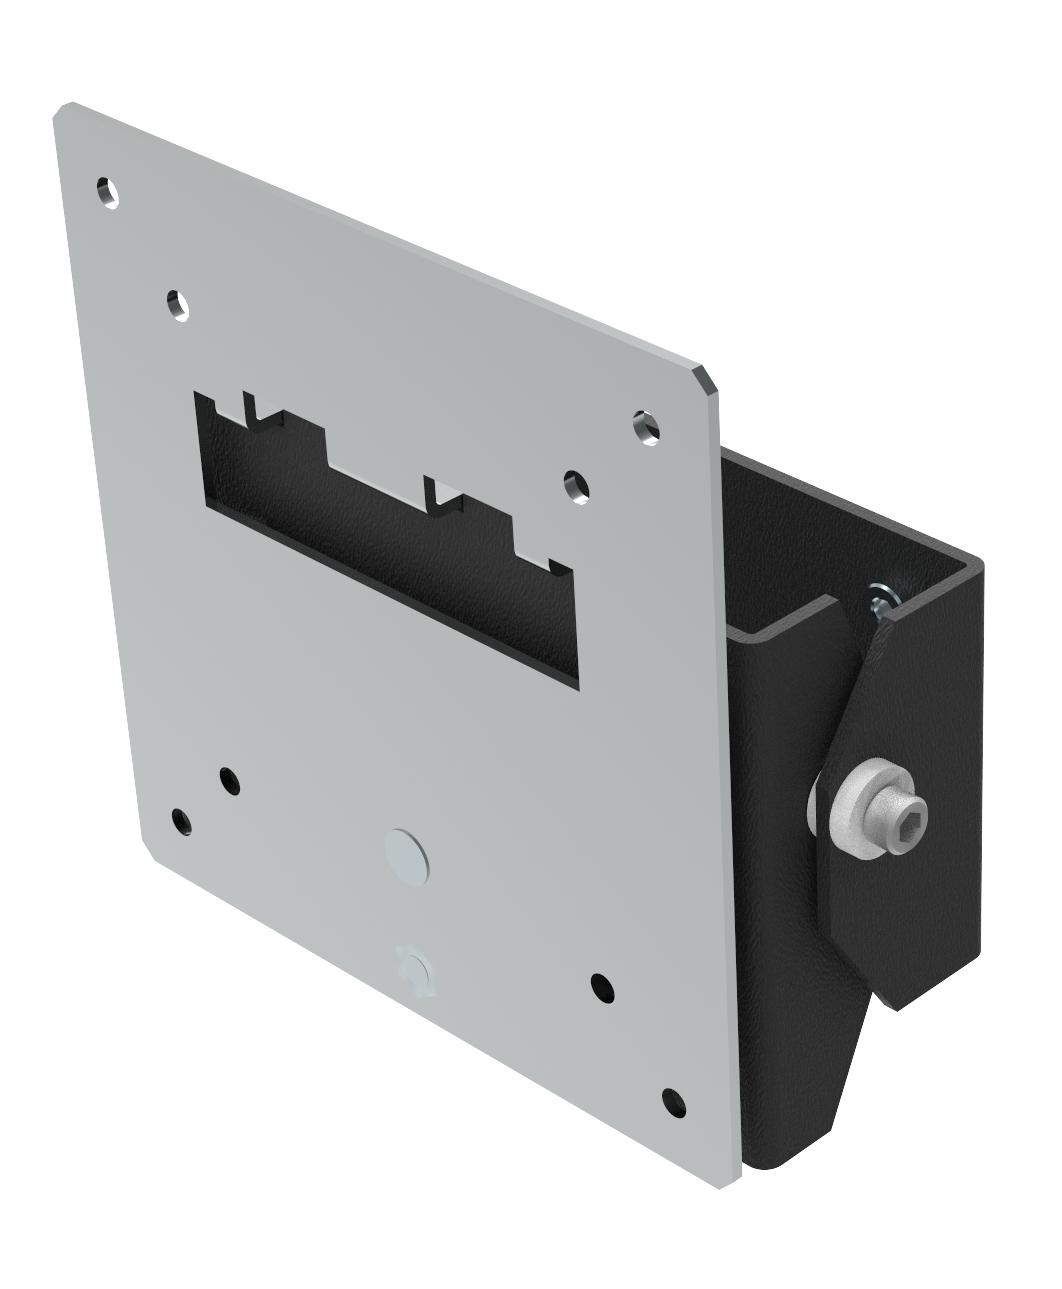 RackSolutions 101-5483 CPU holder accessory